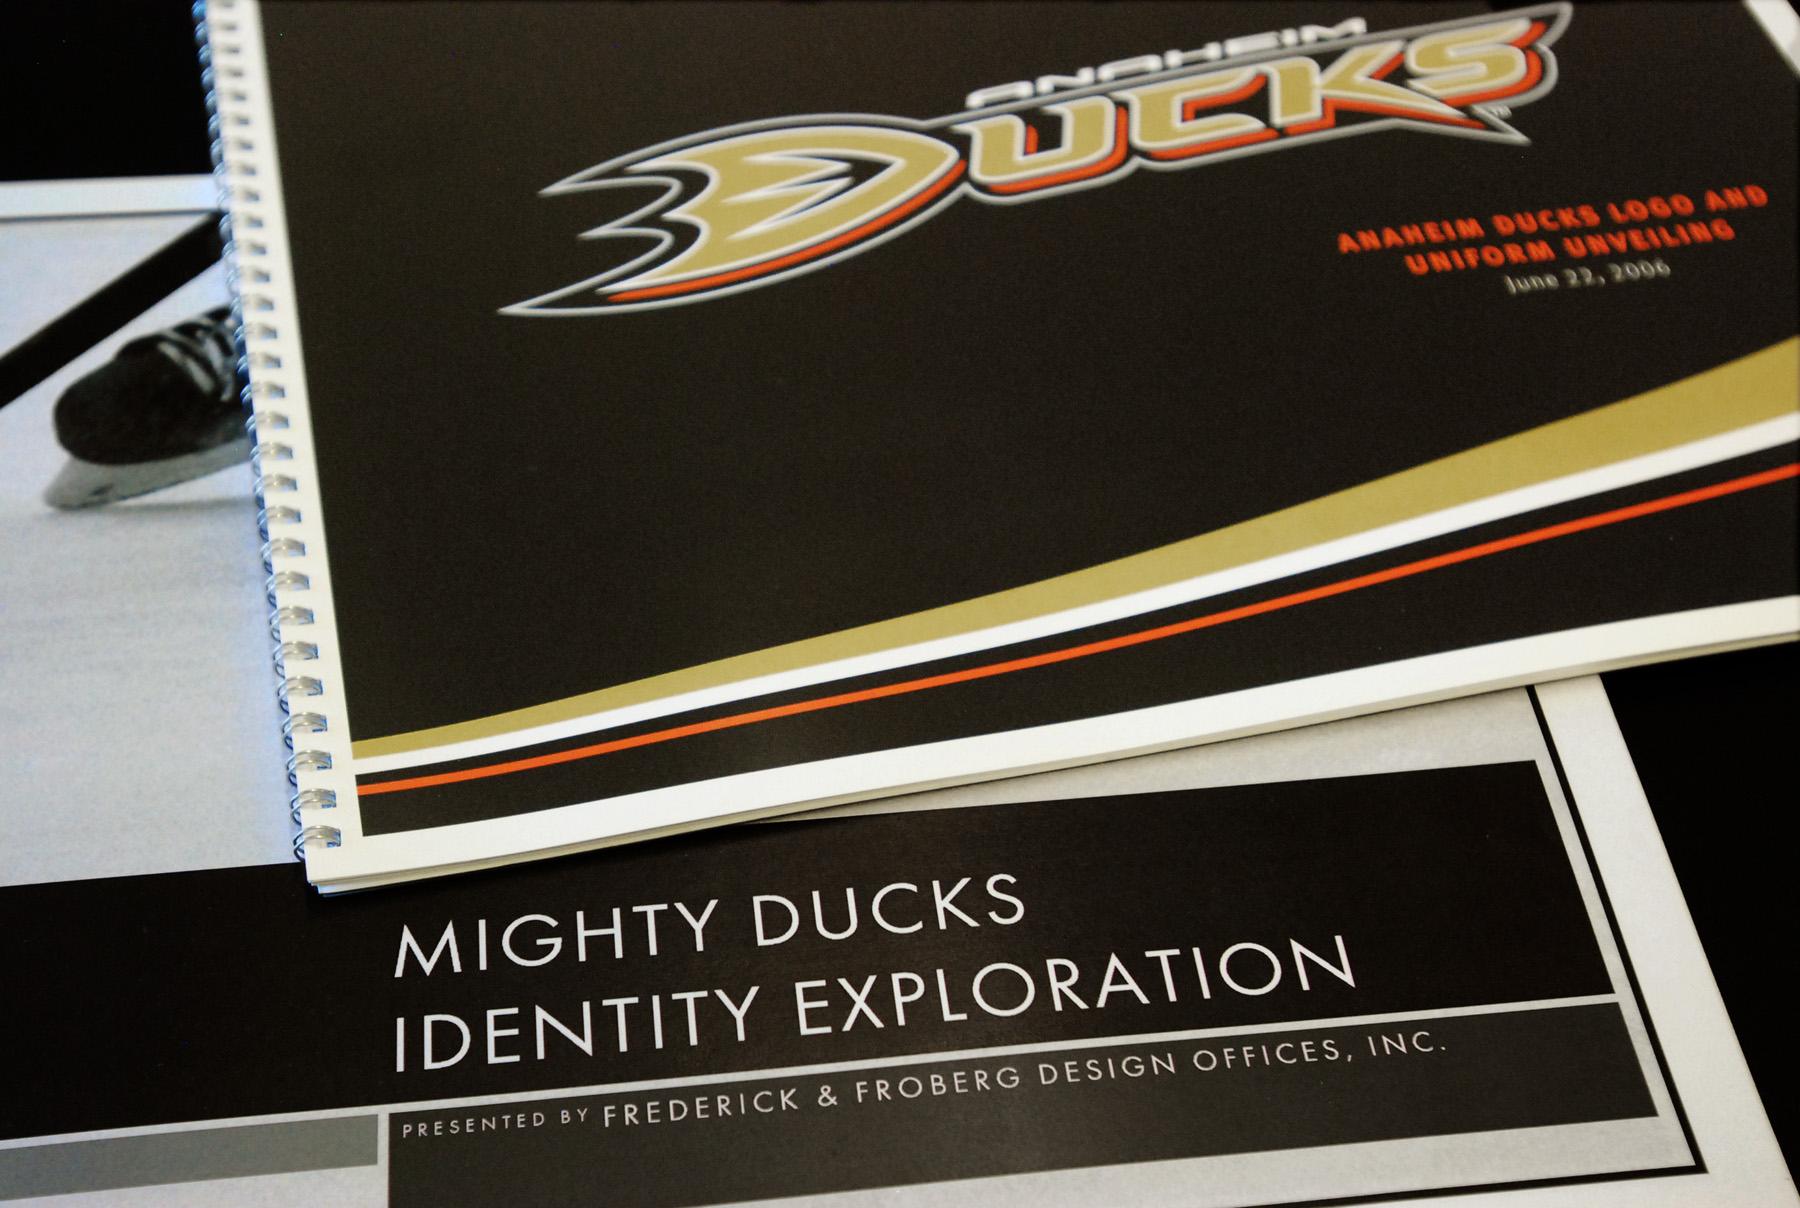 Ducks_Development_StyleGuide.jpg